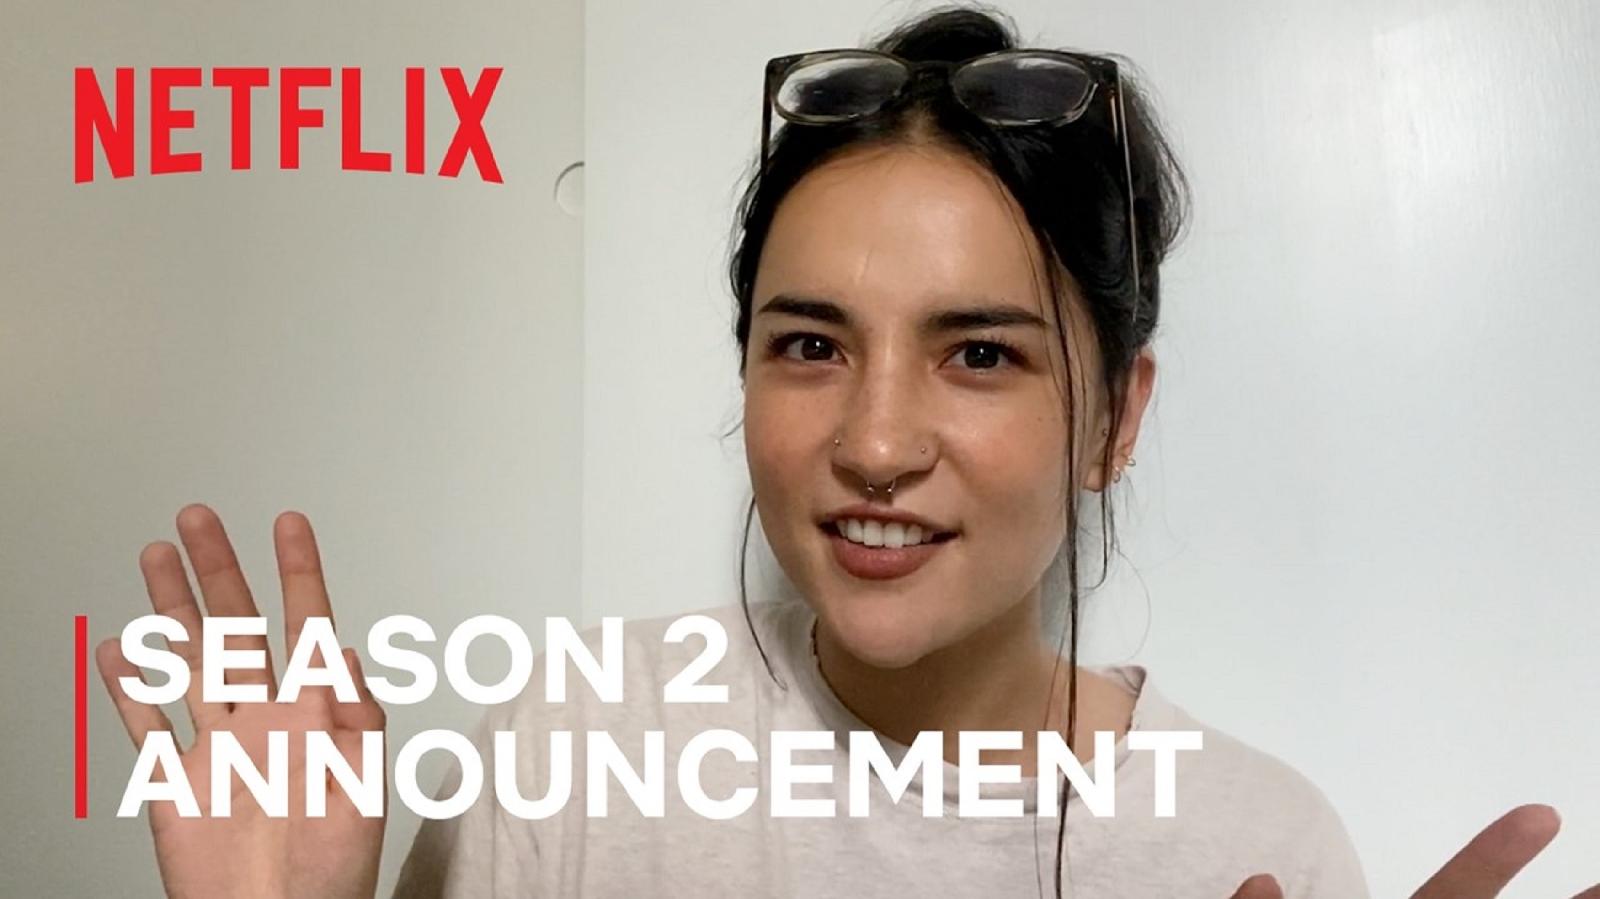 Shadow and Bone (ตำนานกรีชา) ซีรีส์แฟนตาซีสุดยิ่งใหญ่จาก Netflix พร้อมเดินหน้าต่อกับซีซั่นสอง